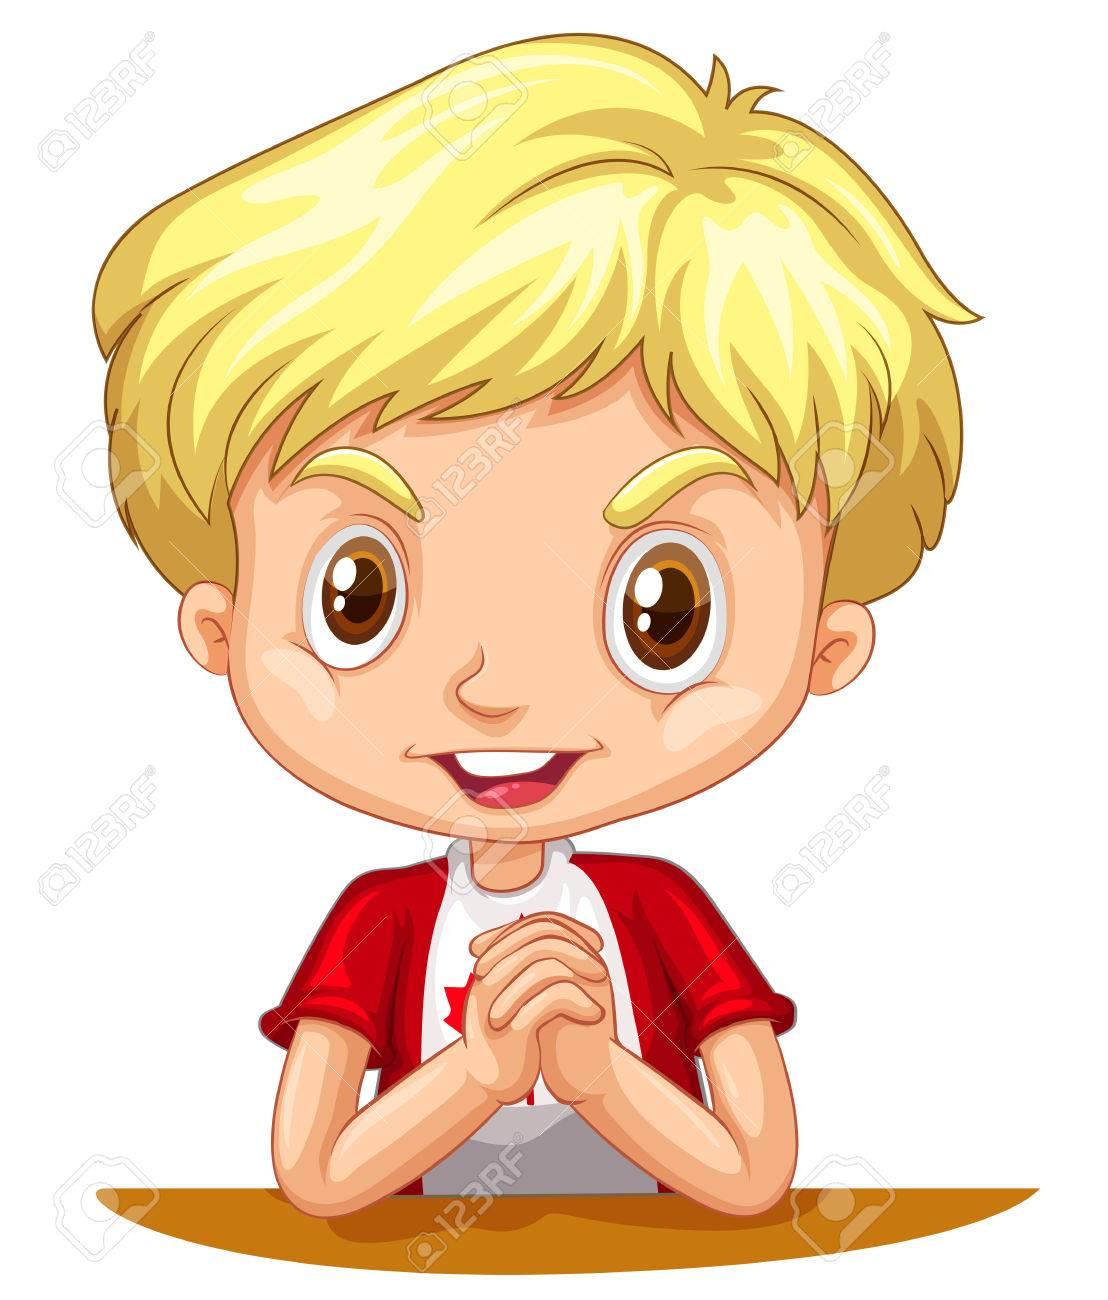 Little boy with blond hair illustration.